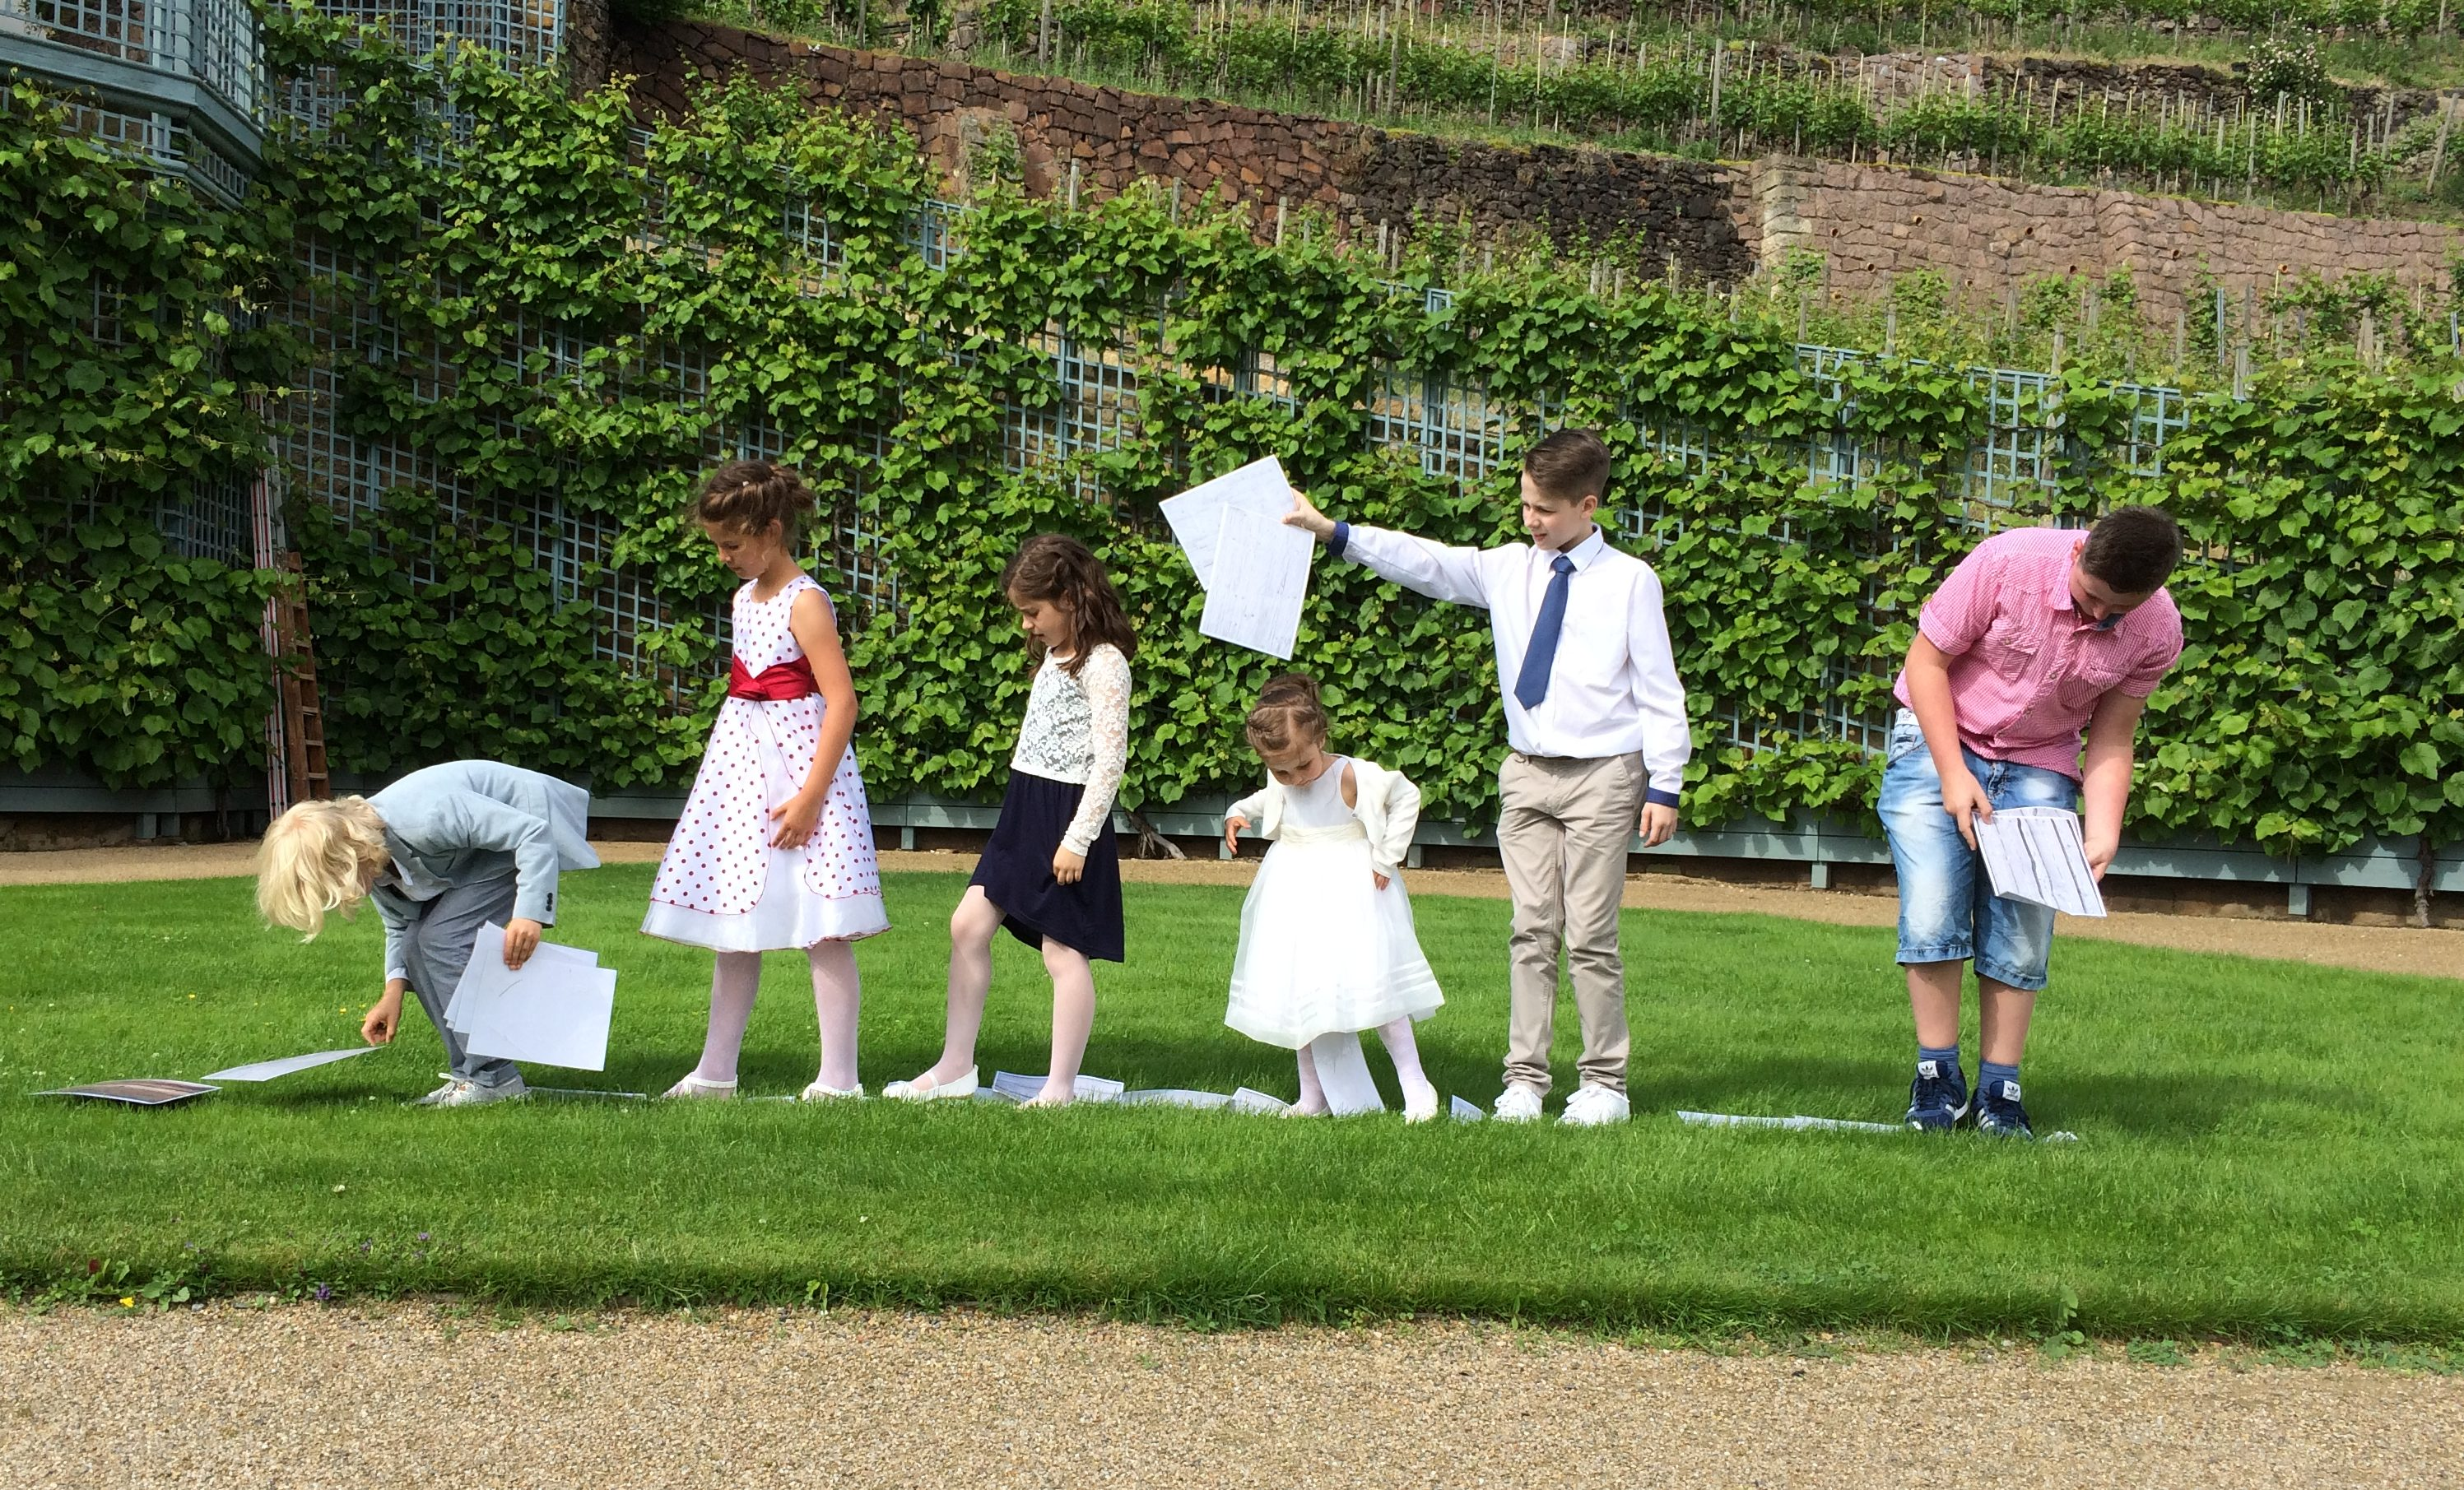 Hochzeit Schnitzeljagd